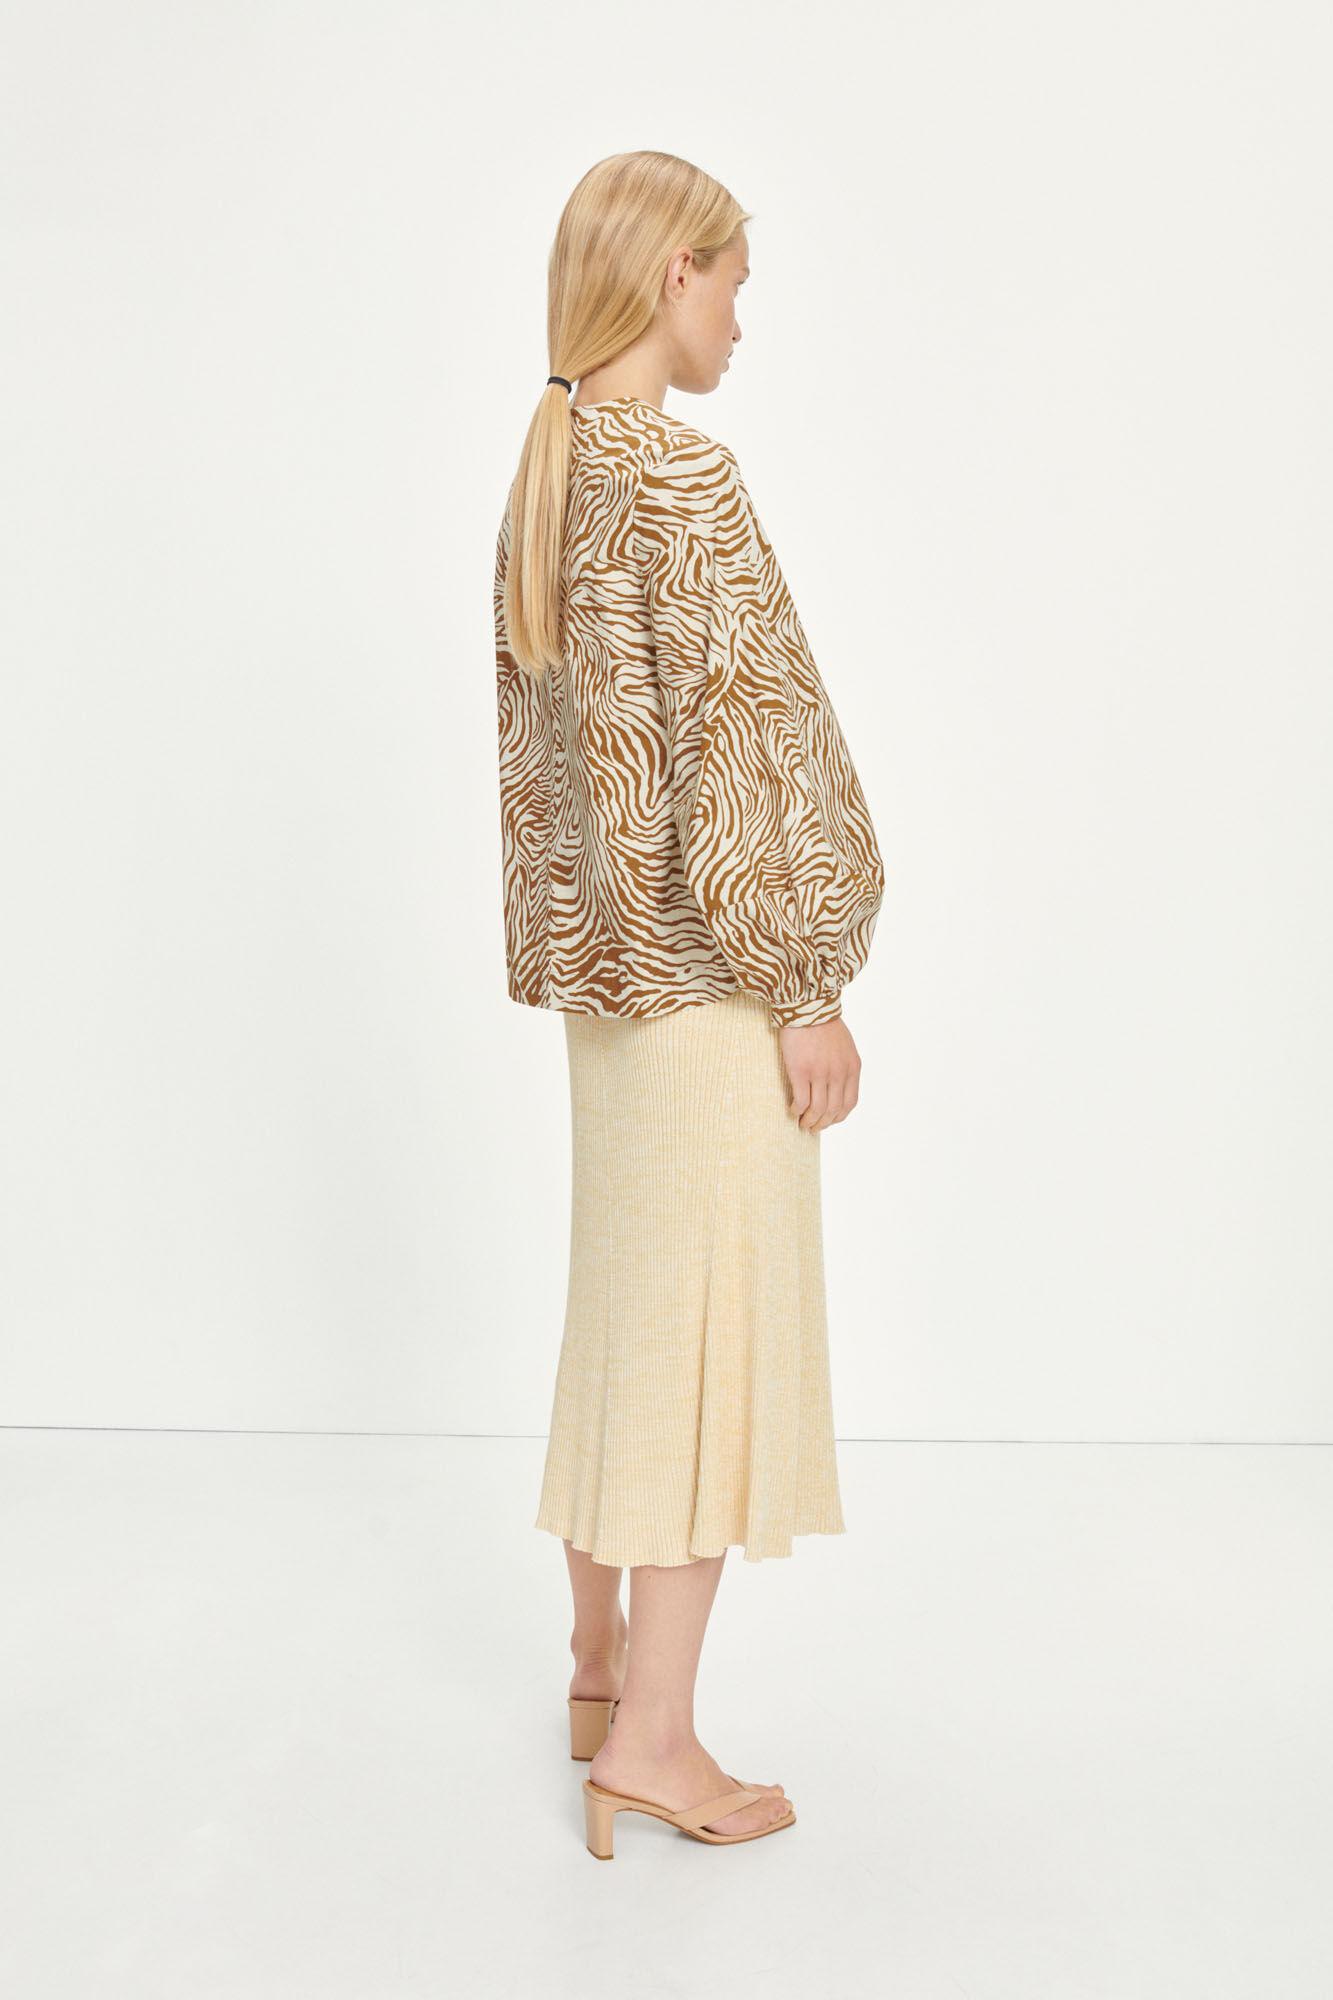 Aram blouse aop 10783